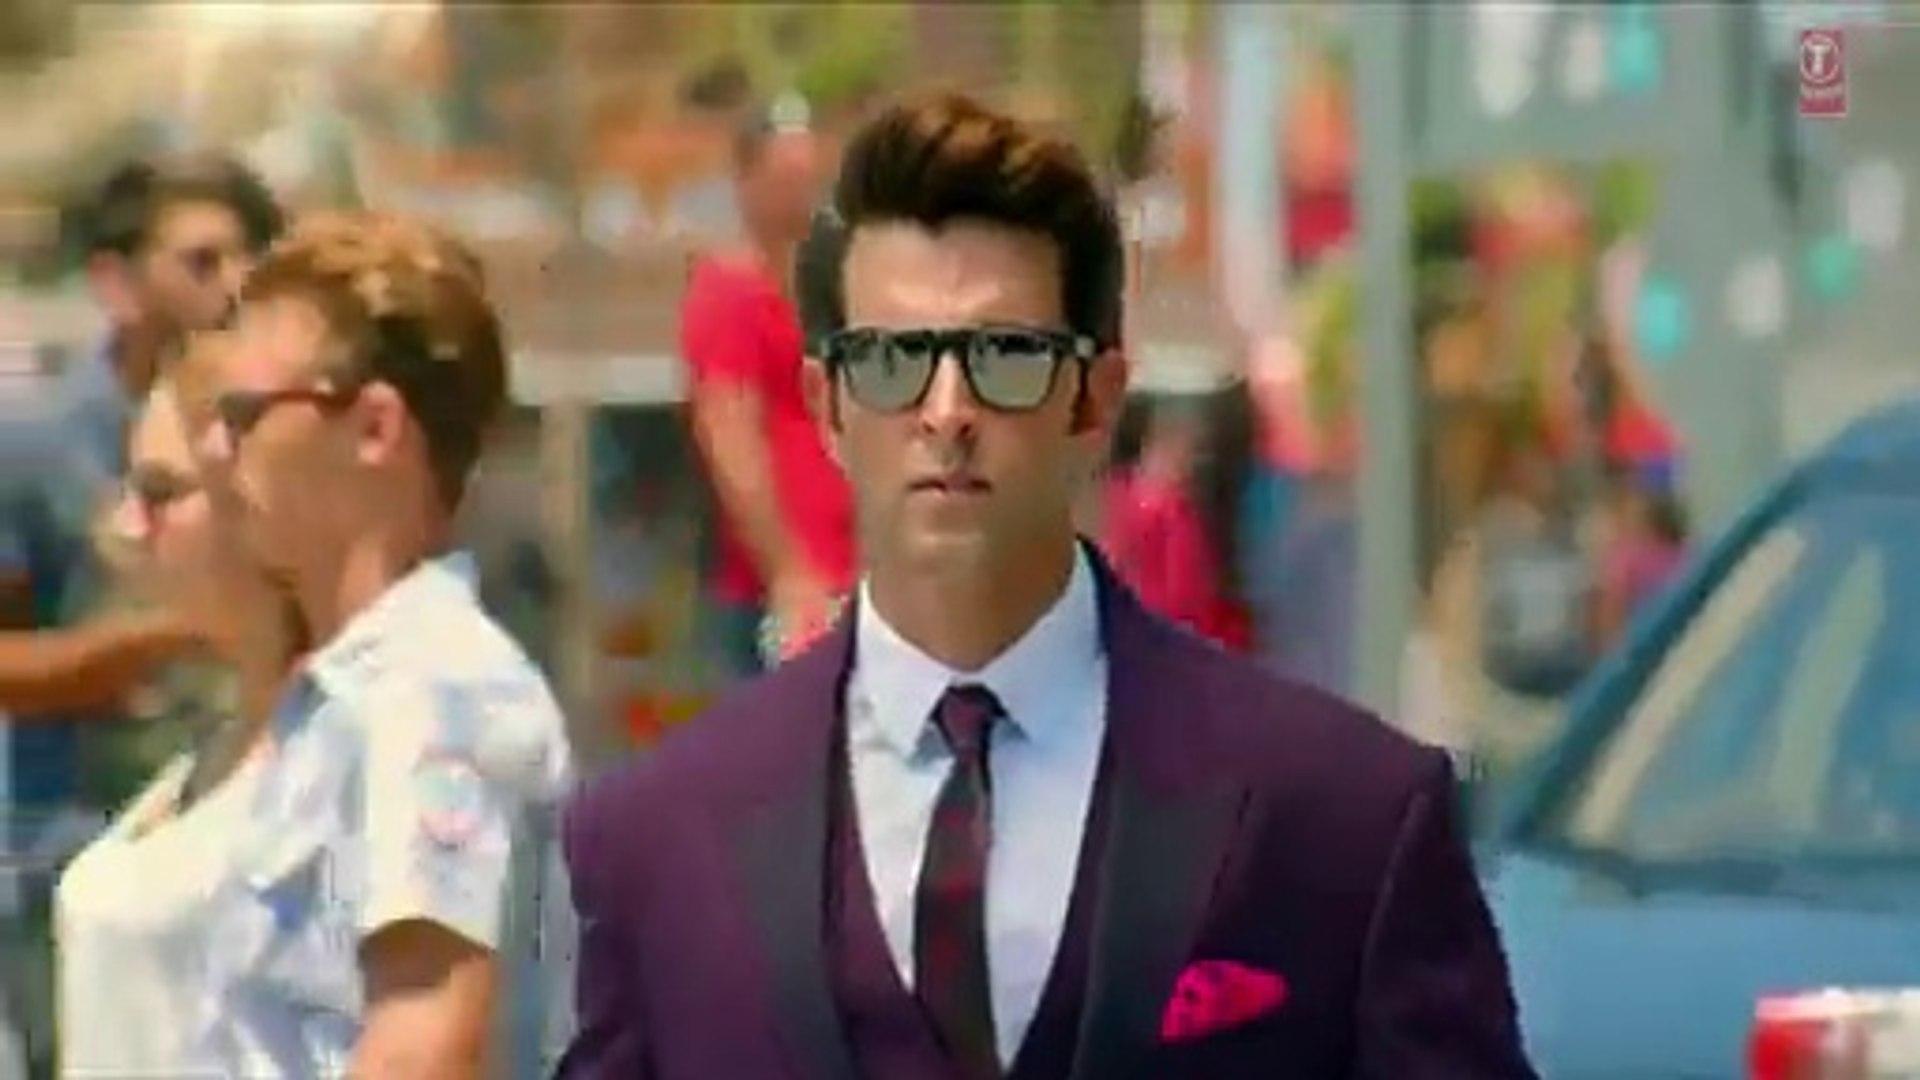 Dheere Dheere Full Video Song [2015] Yo Yo Honey Singh - Hrithik Roshan,  Sonam Kapoor